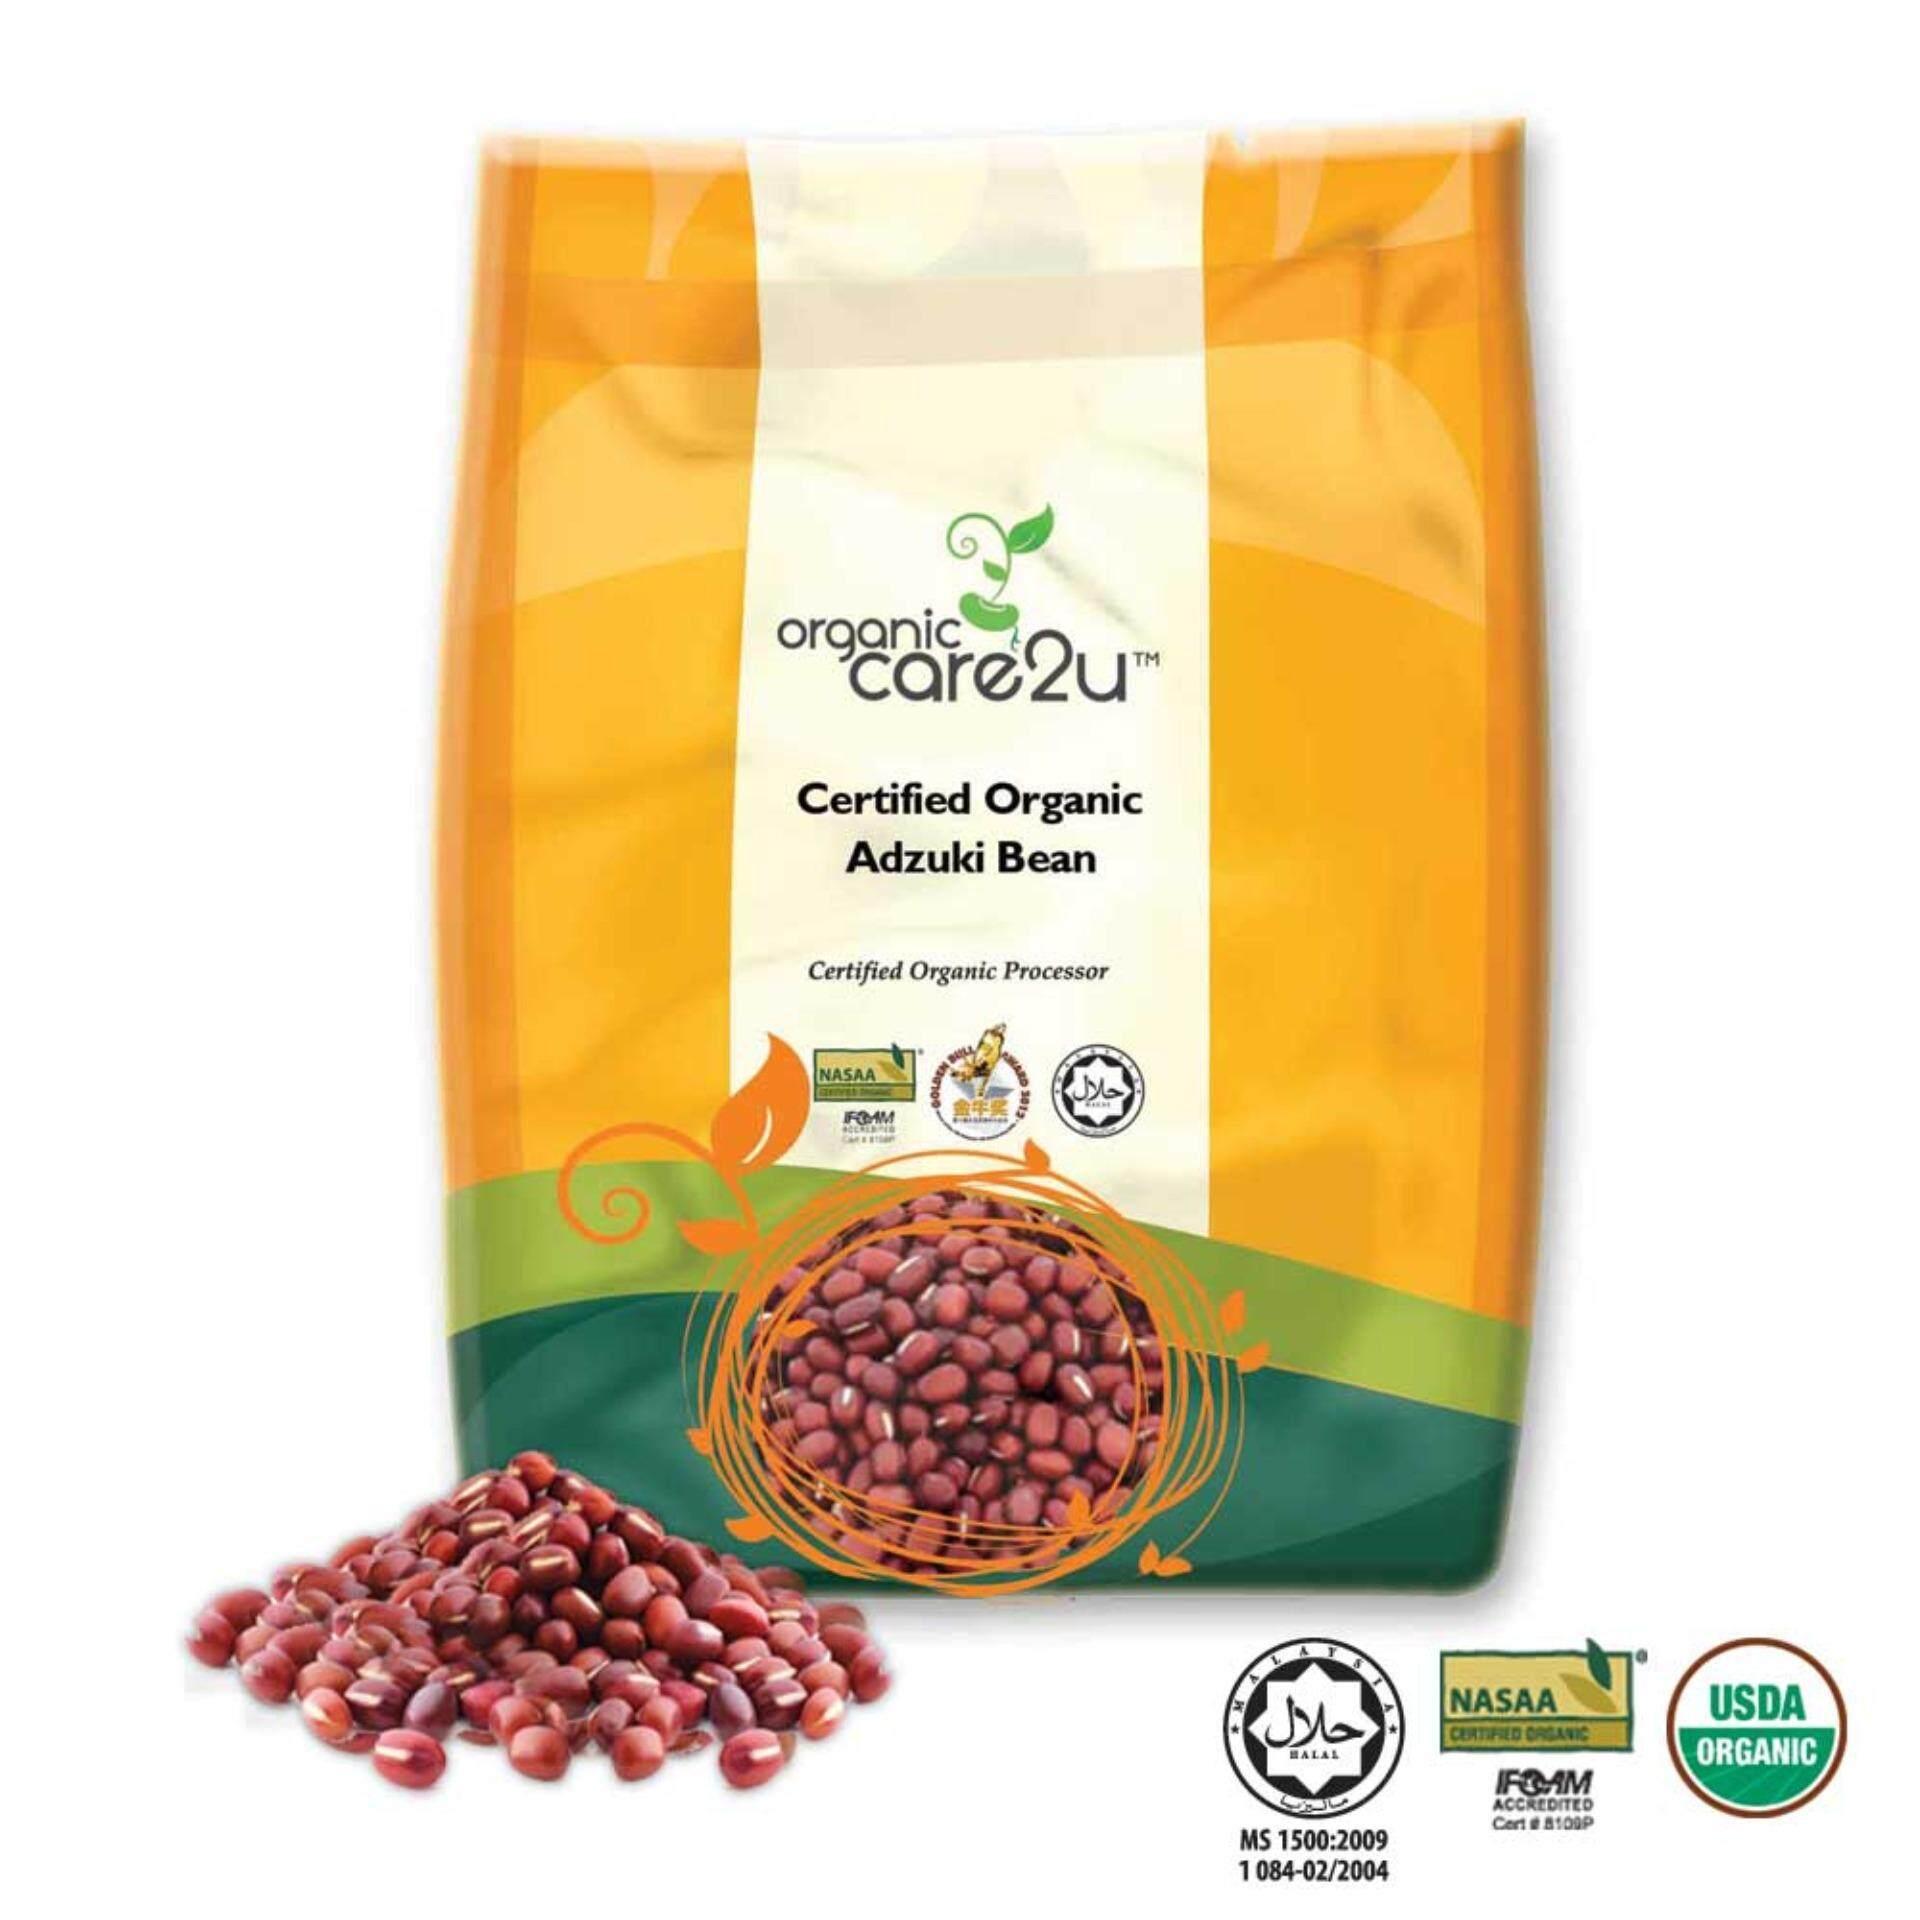 Organic Care2u Organic Adzuki Bean (400g)